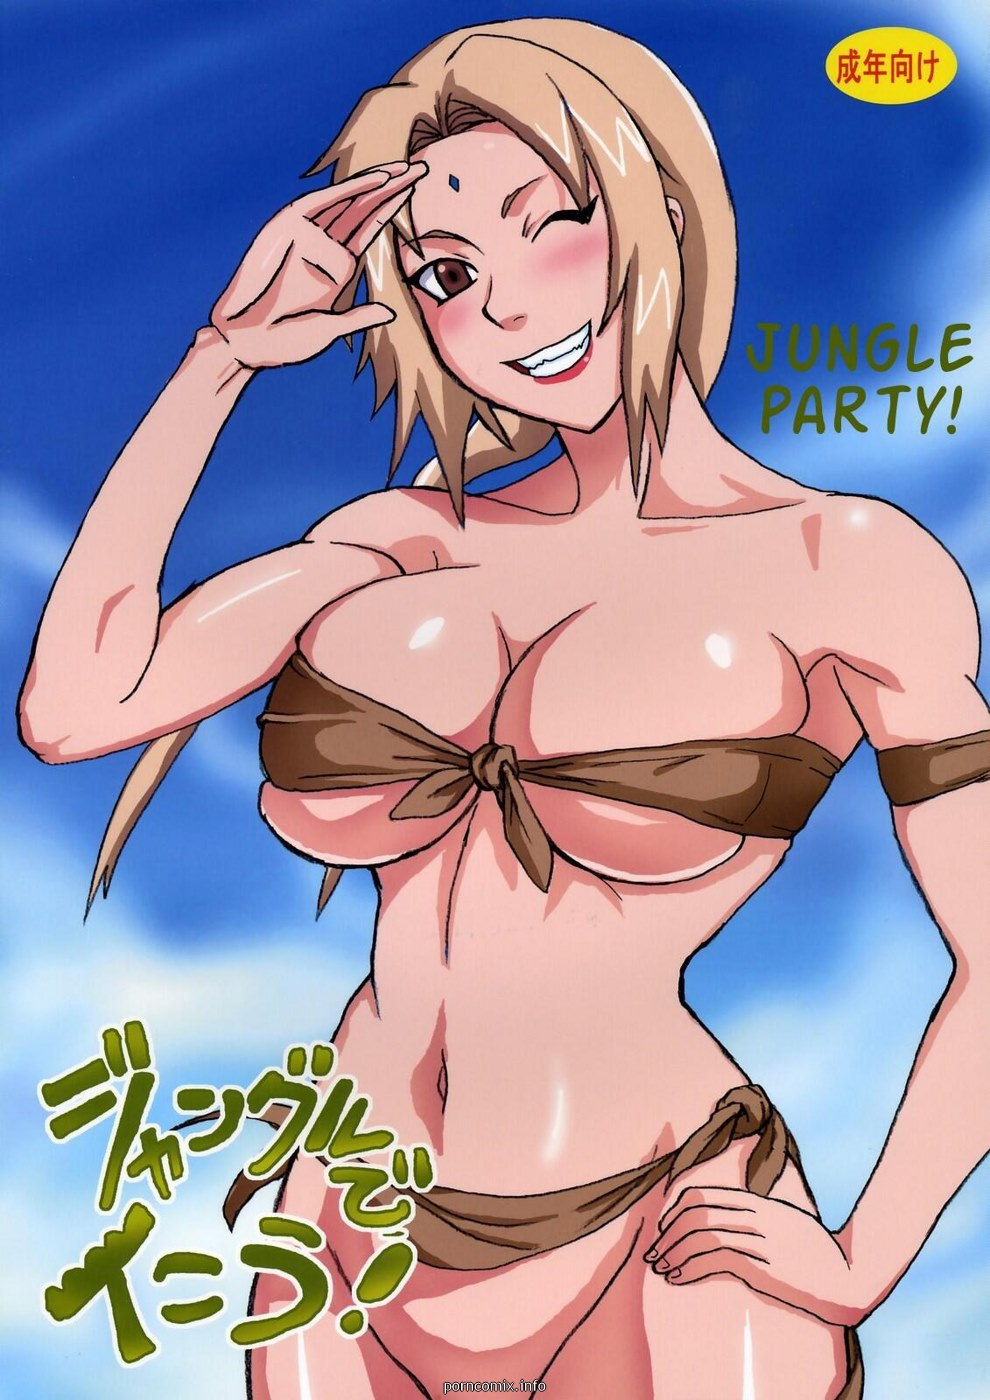 Naruto- Jungle Party Porn Comics 8 Muses-3384